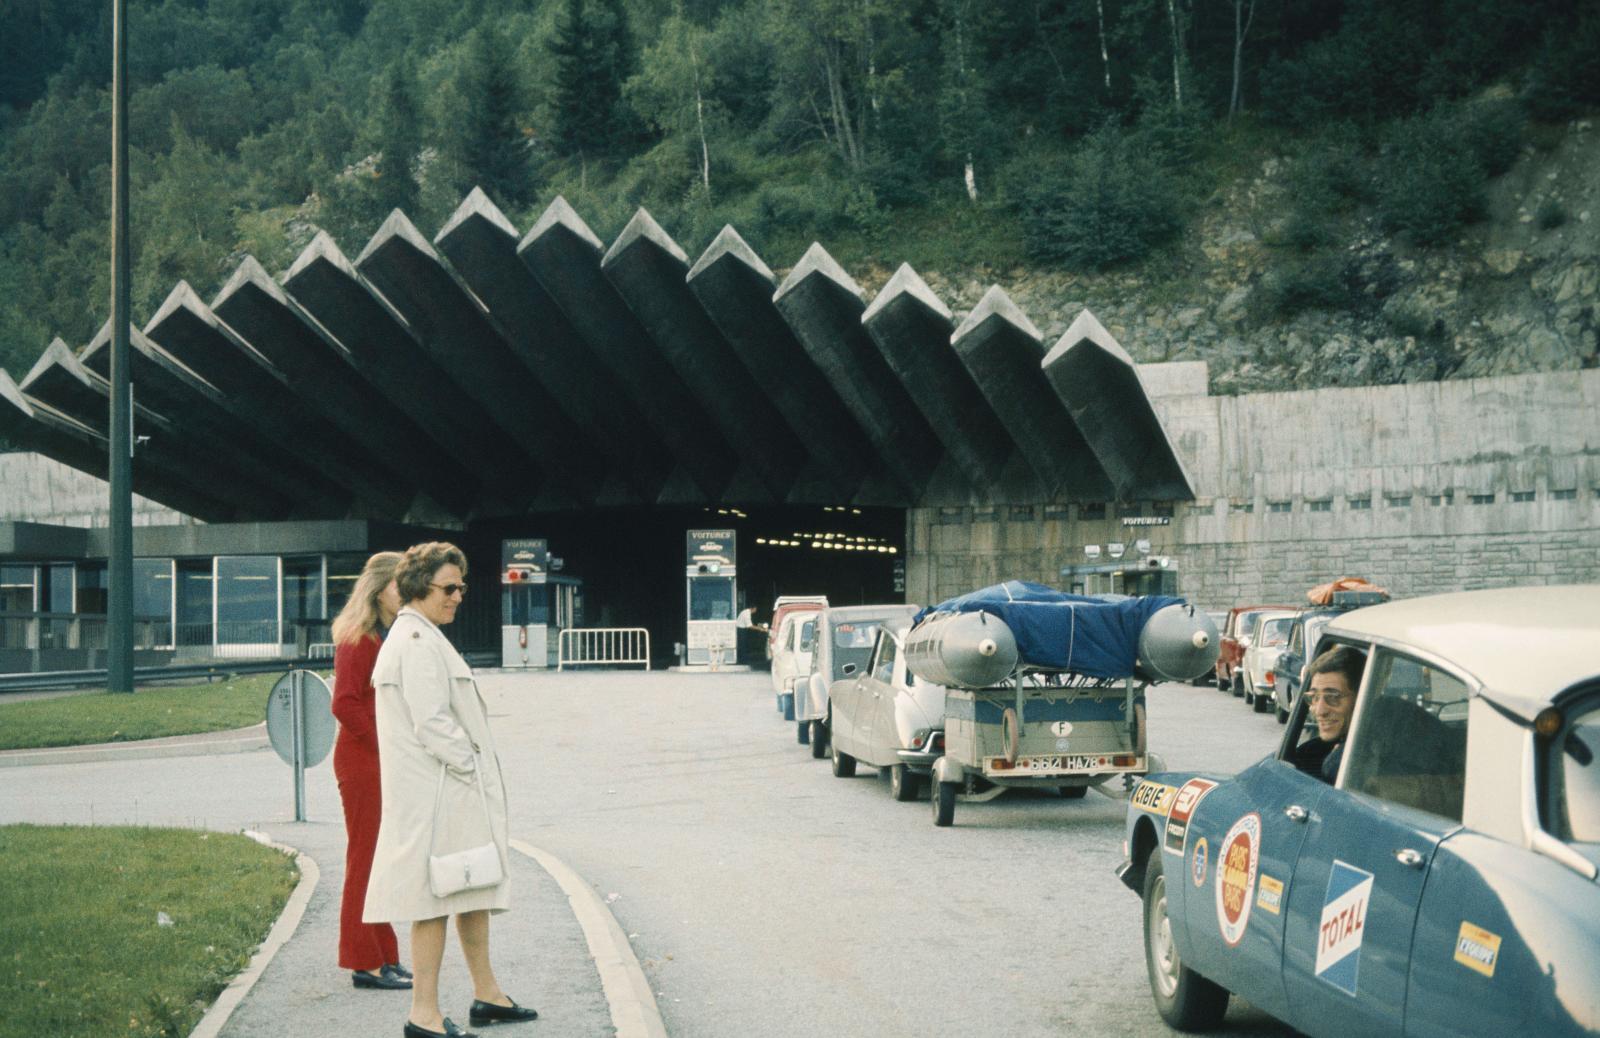 Rali do Marrocos - Túnel - DS - 1970